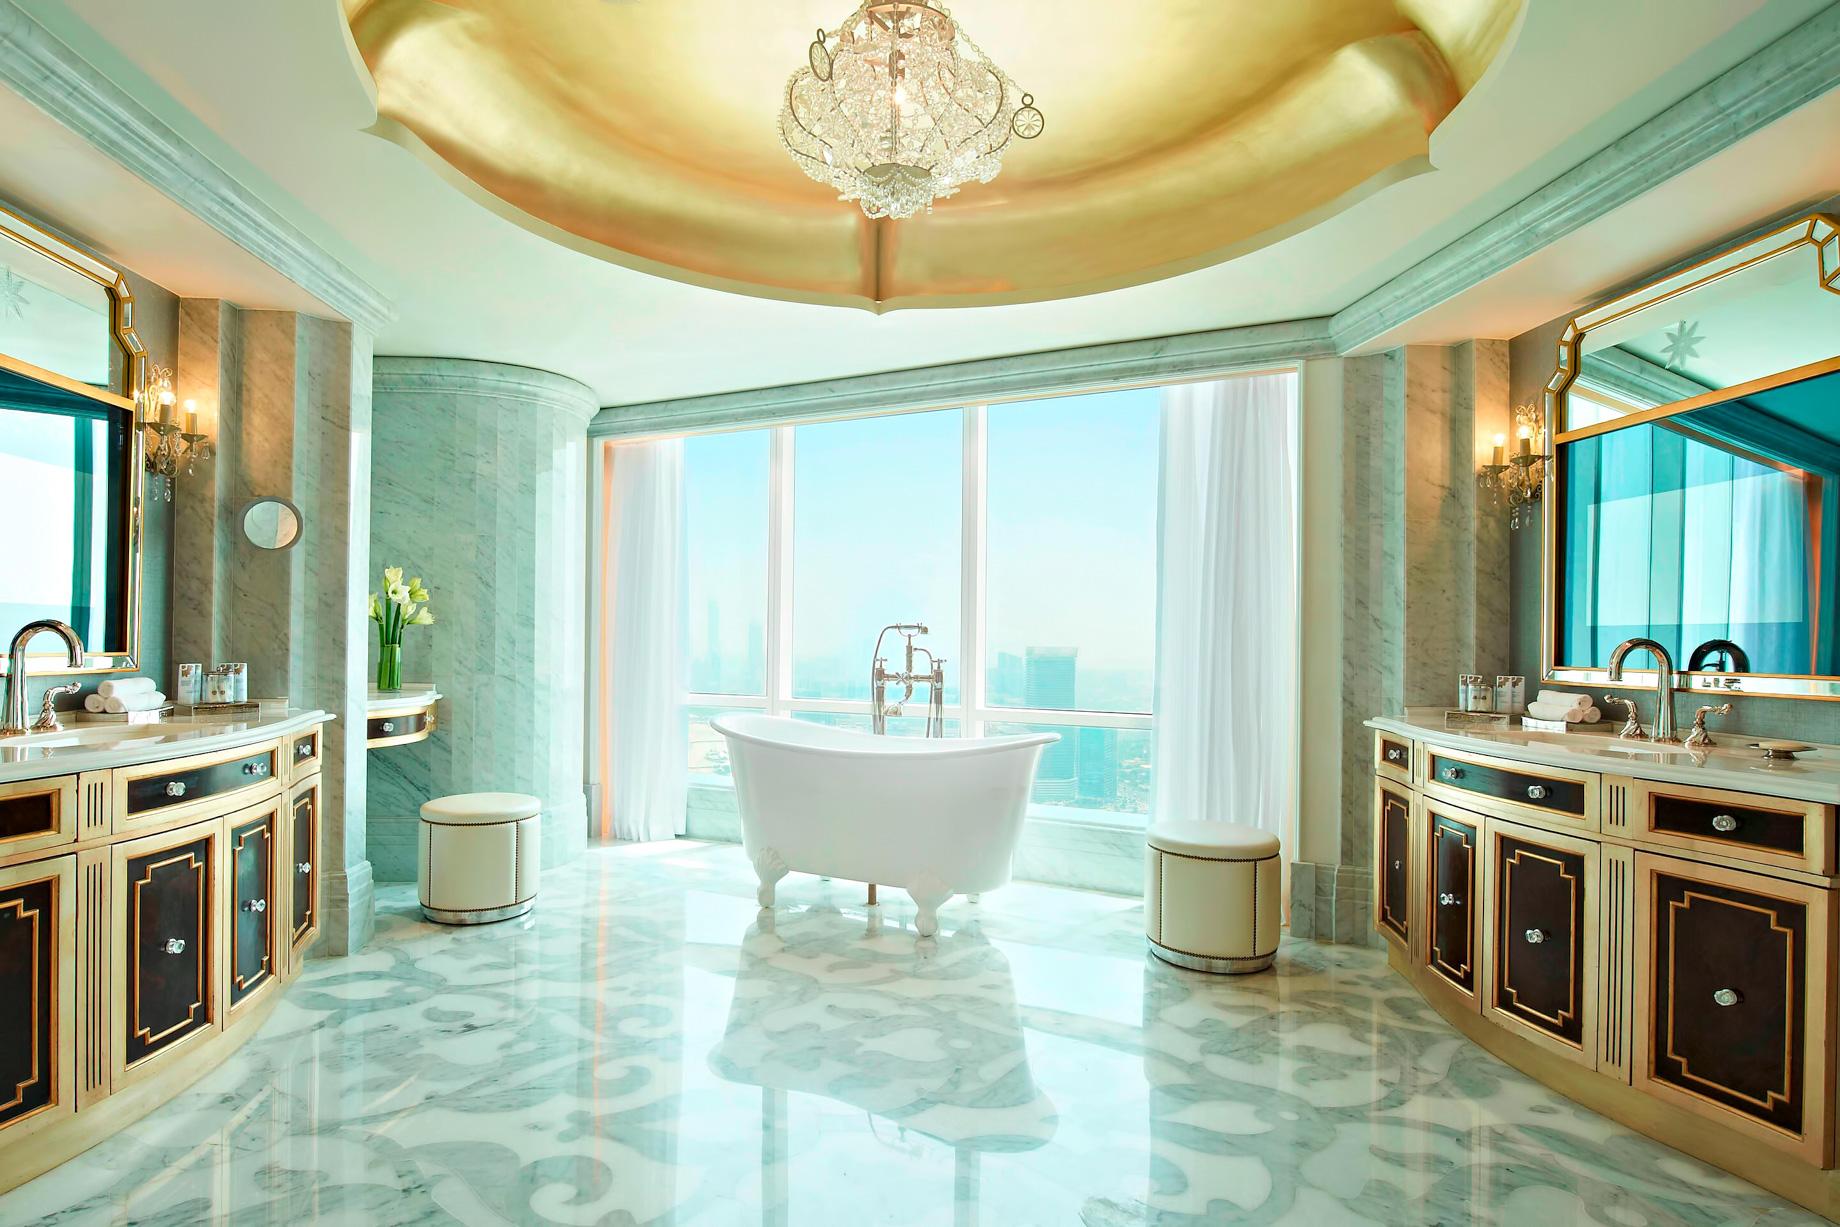 The St. Regis Abu Dhabi Luxury Hotel - Abu Dhabi, United Arab Emirates - Al Manhal Suite Bathroom